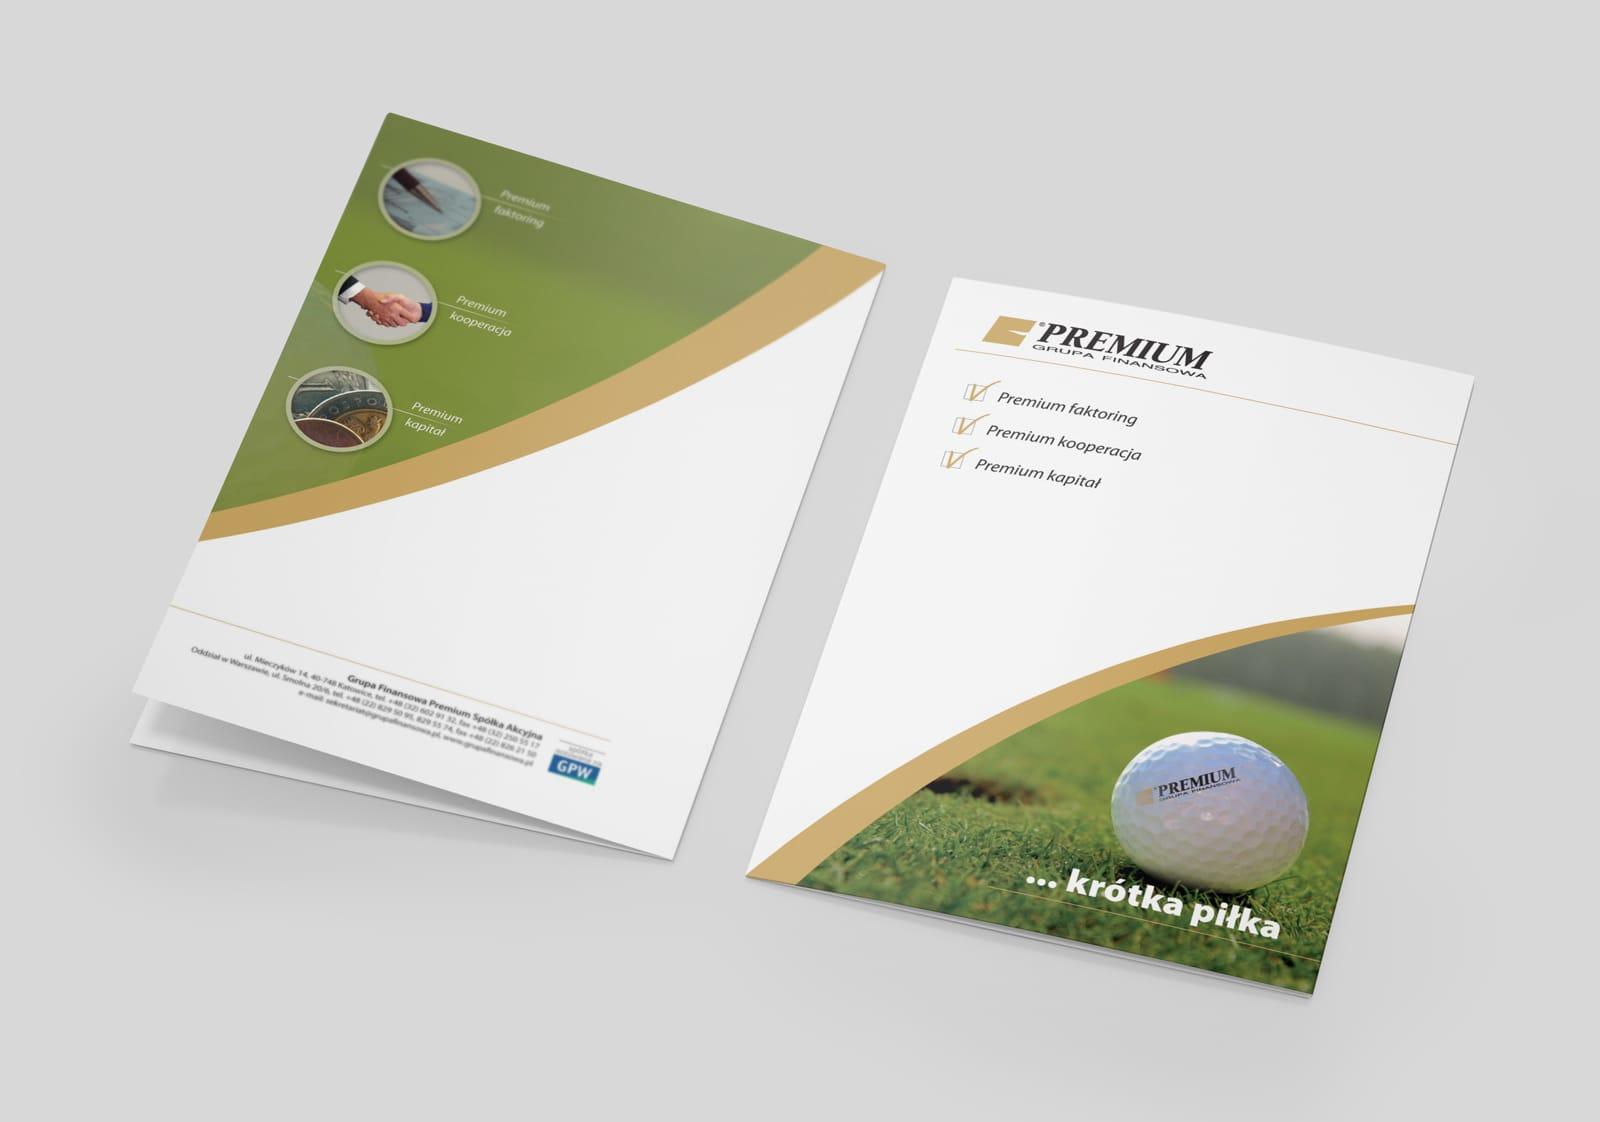 Grupa Finansowa Premium SA teczki reklamowe